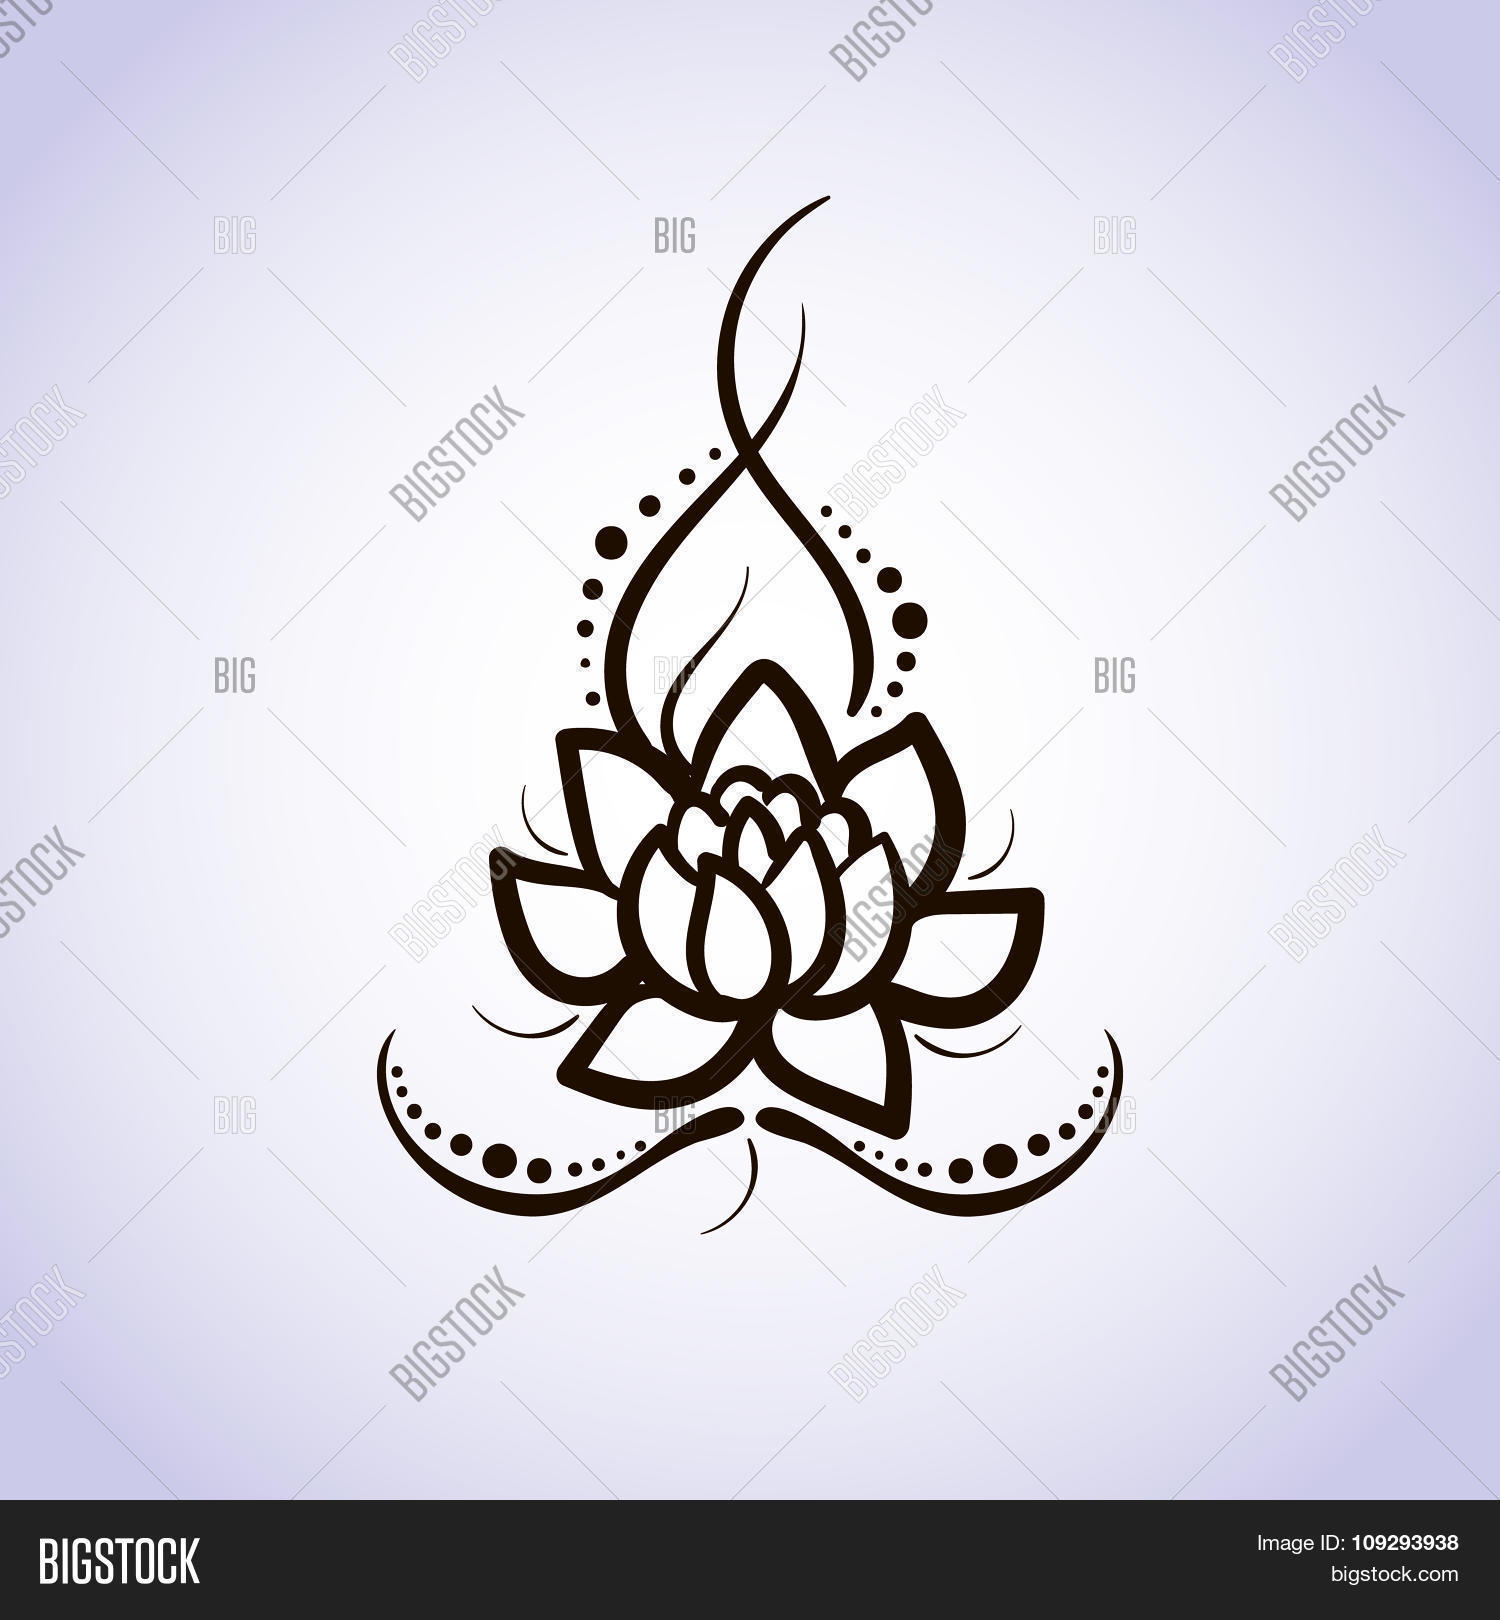 Lotus flower pattern vector photo free trial bigstock lotus flower pattern line on isolated background logo for yoga studio spa india izmirmasajfo